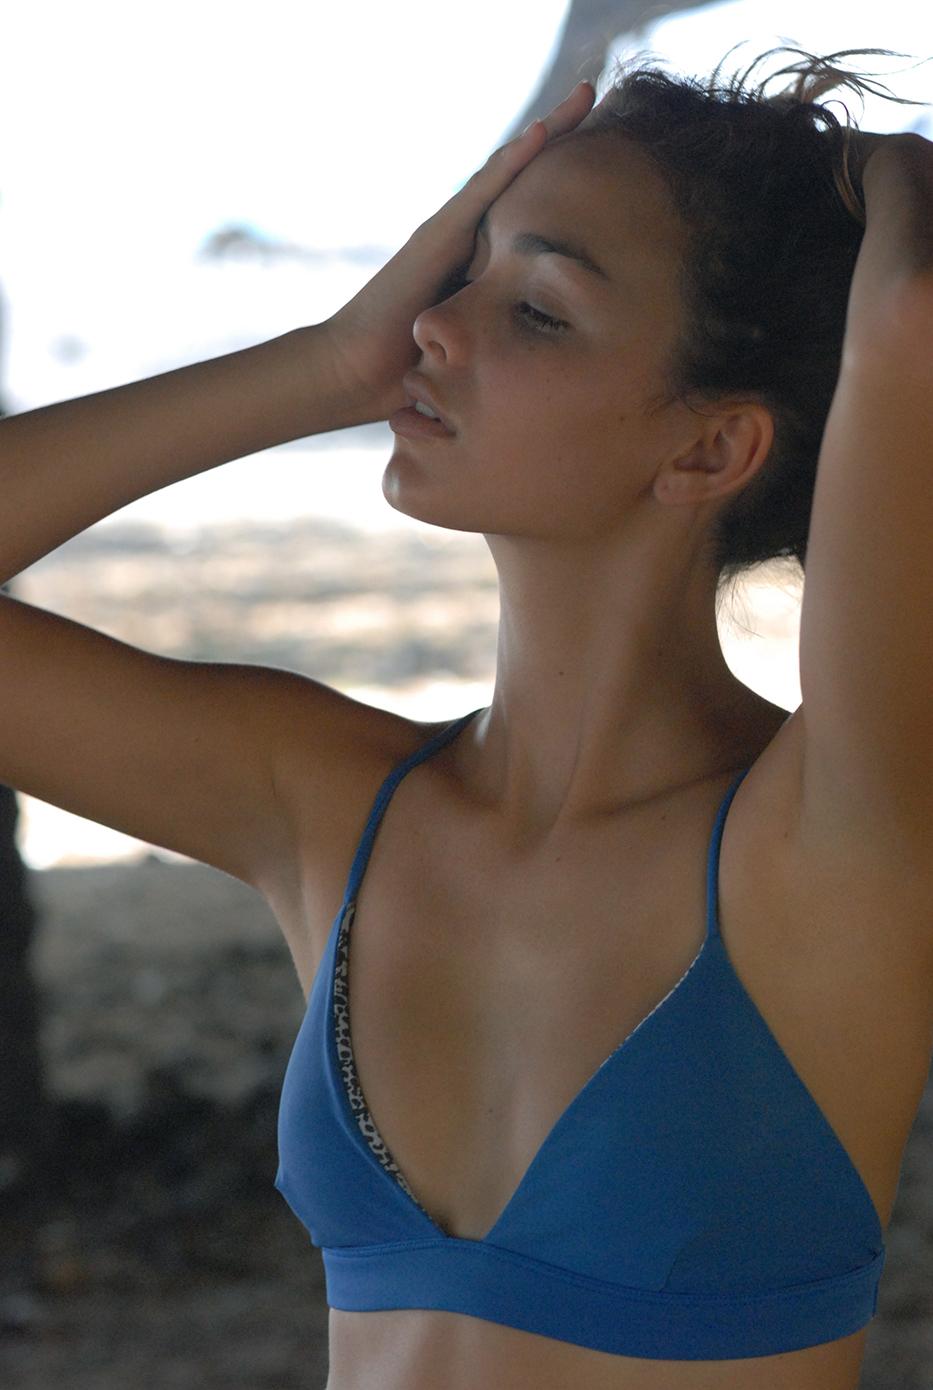 06_Swimbook_Acacia_swimwear_Helena_Brewbaker_DSC_0379.jpg